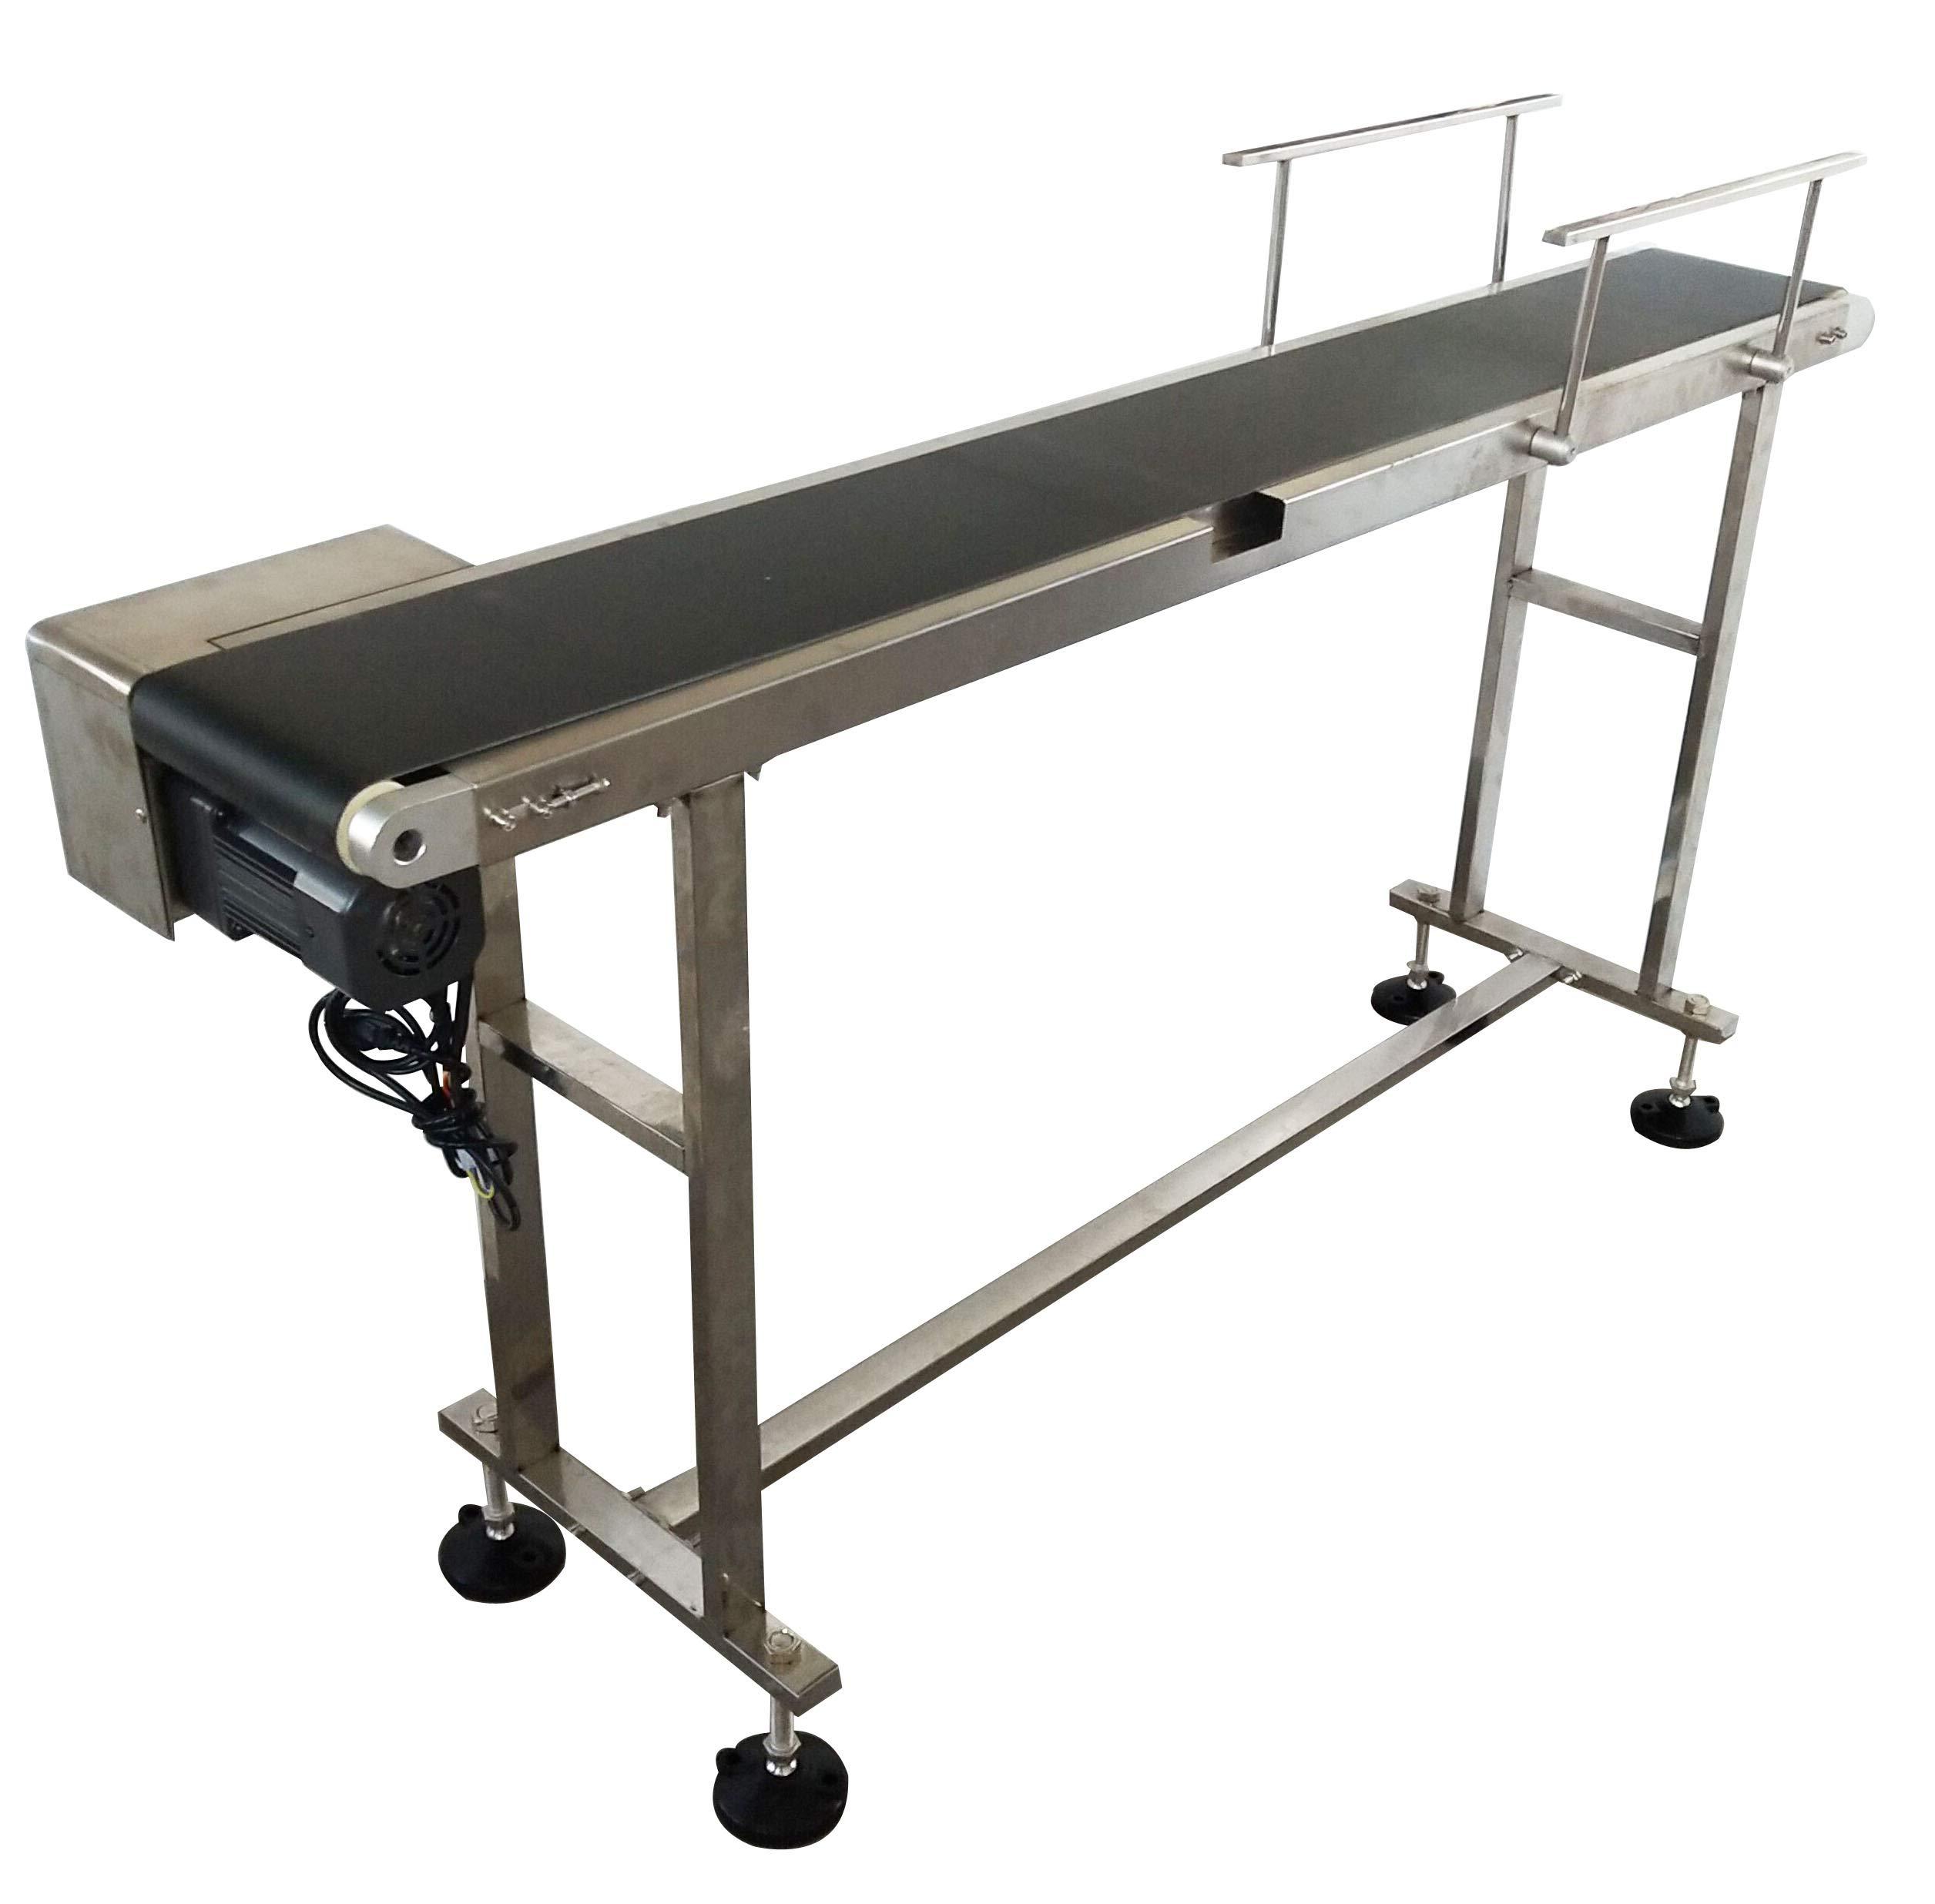 TECHTONGDA PVC Flat Conveyor Belt Systems for Industrial Transport Conveyor Length 66inch Belt Width 7.8inch 110V